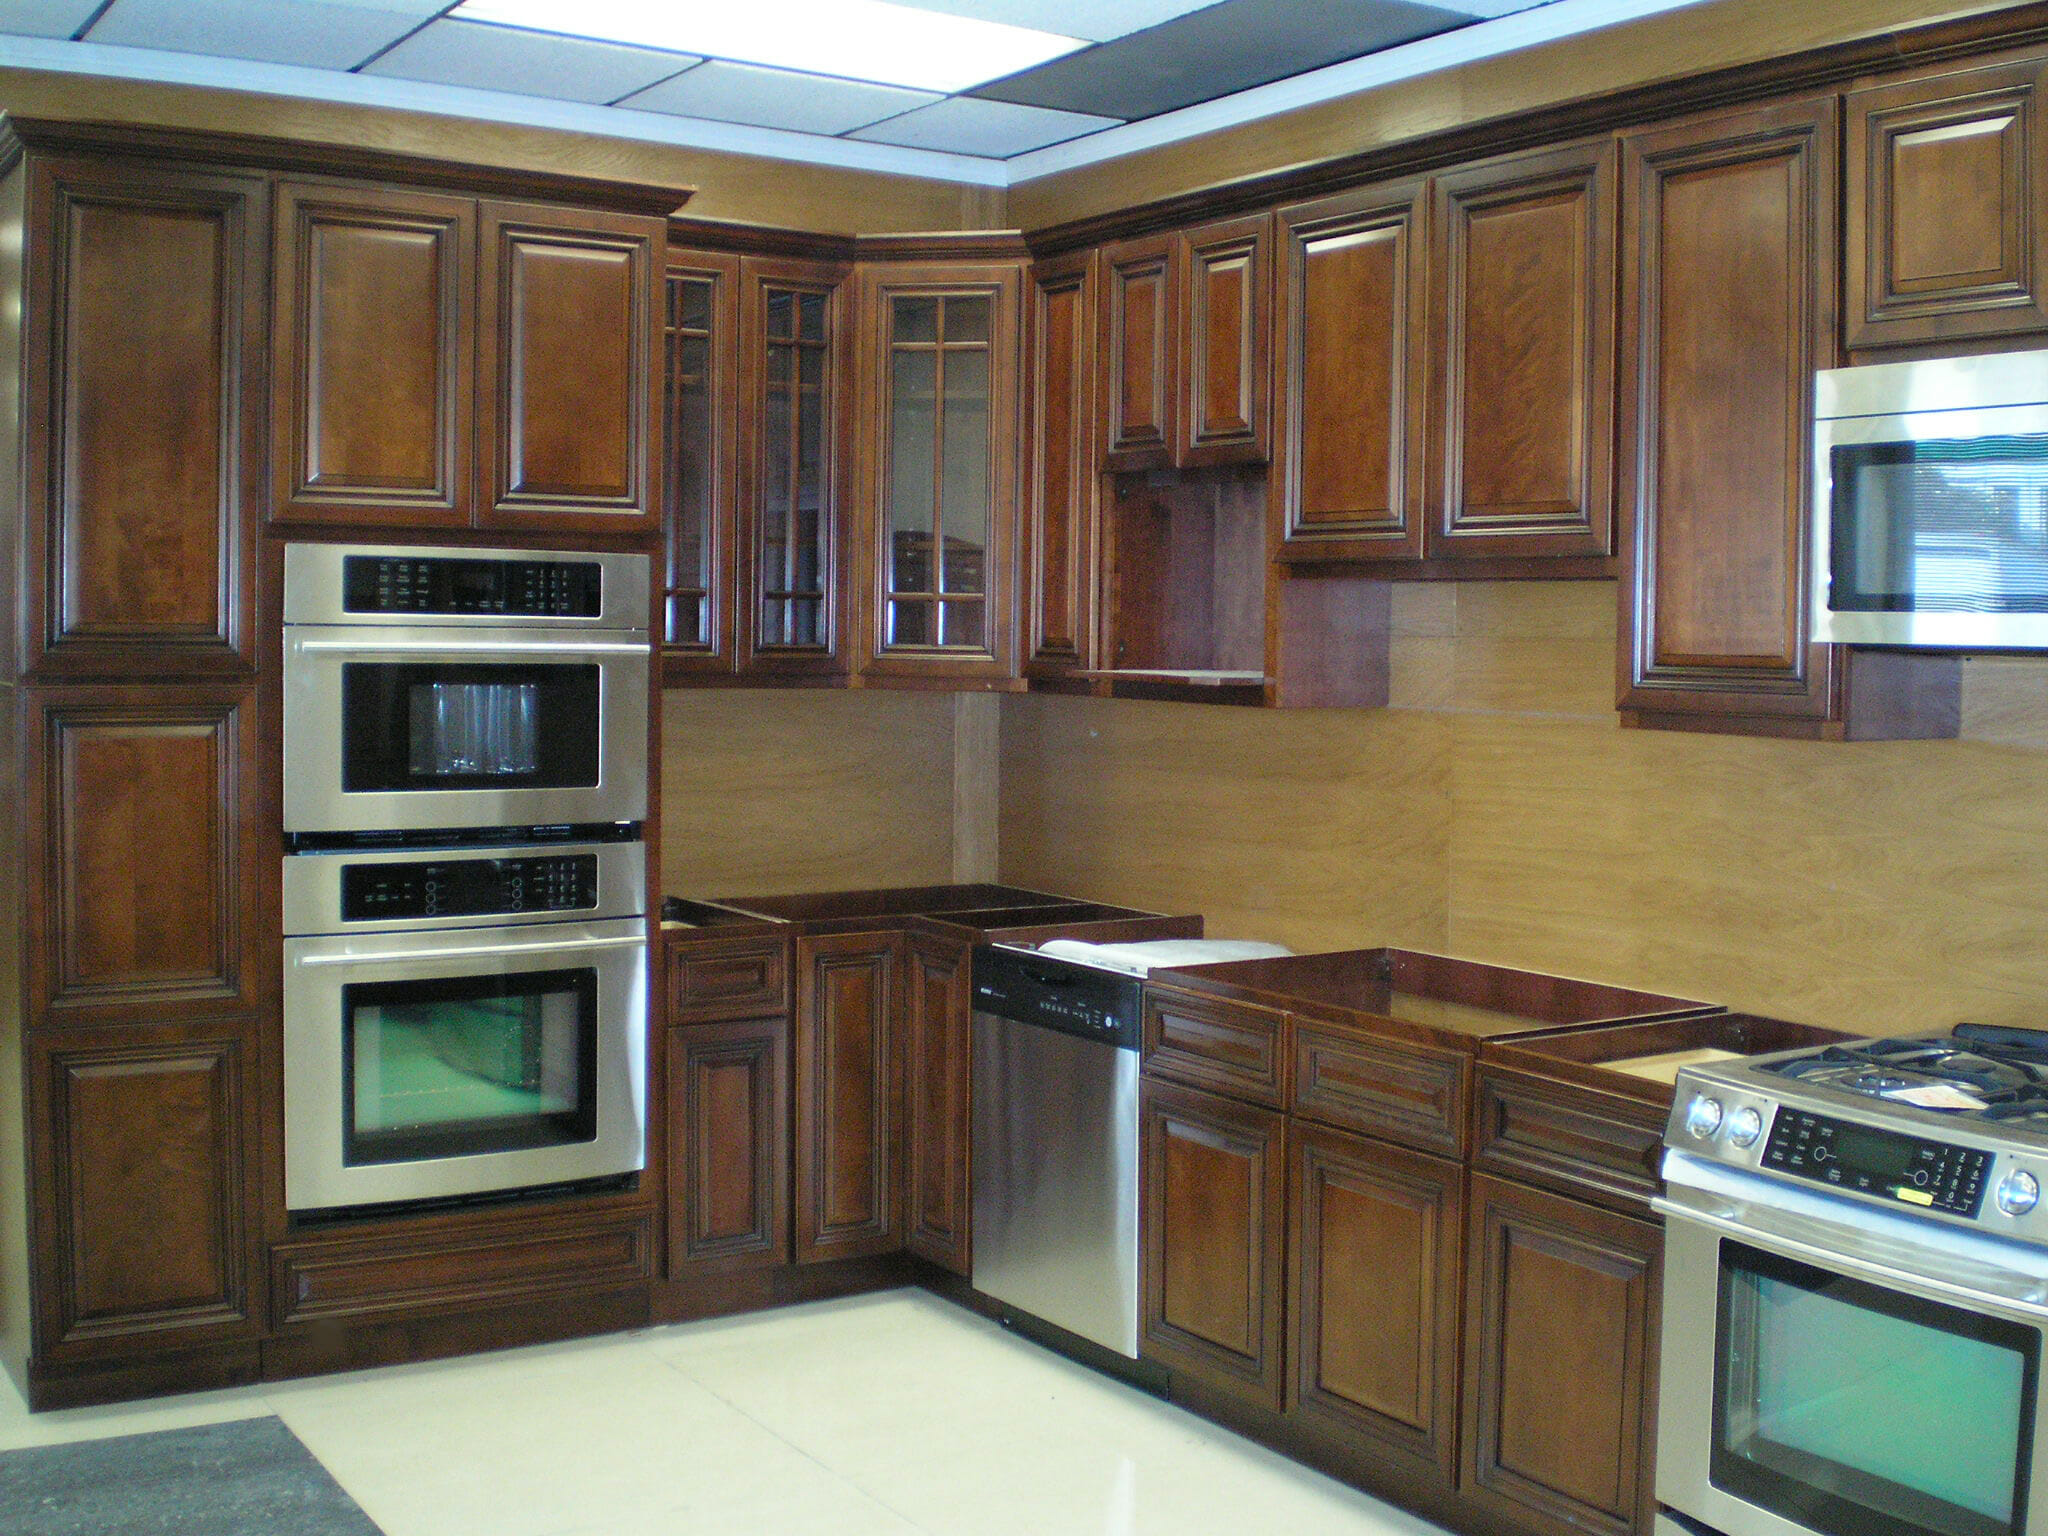 walnut kitchen cabinets walnut kitchen cabinets OLYMPUS DIGITAL CAMERA